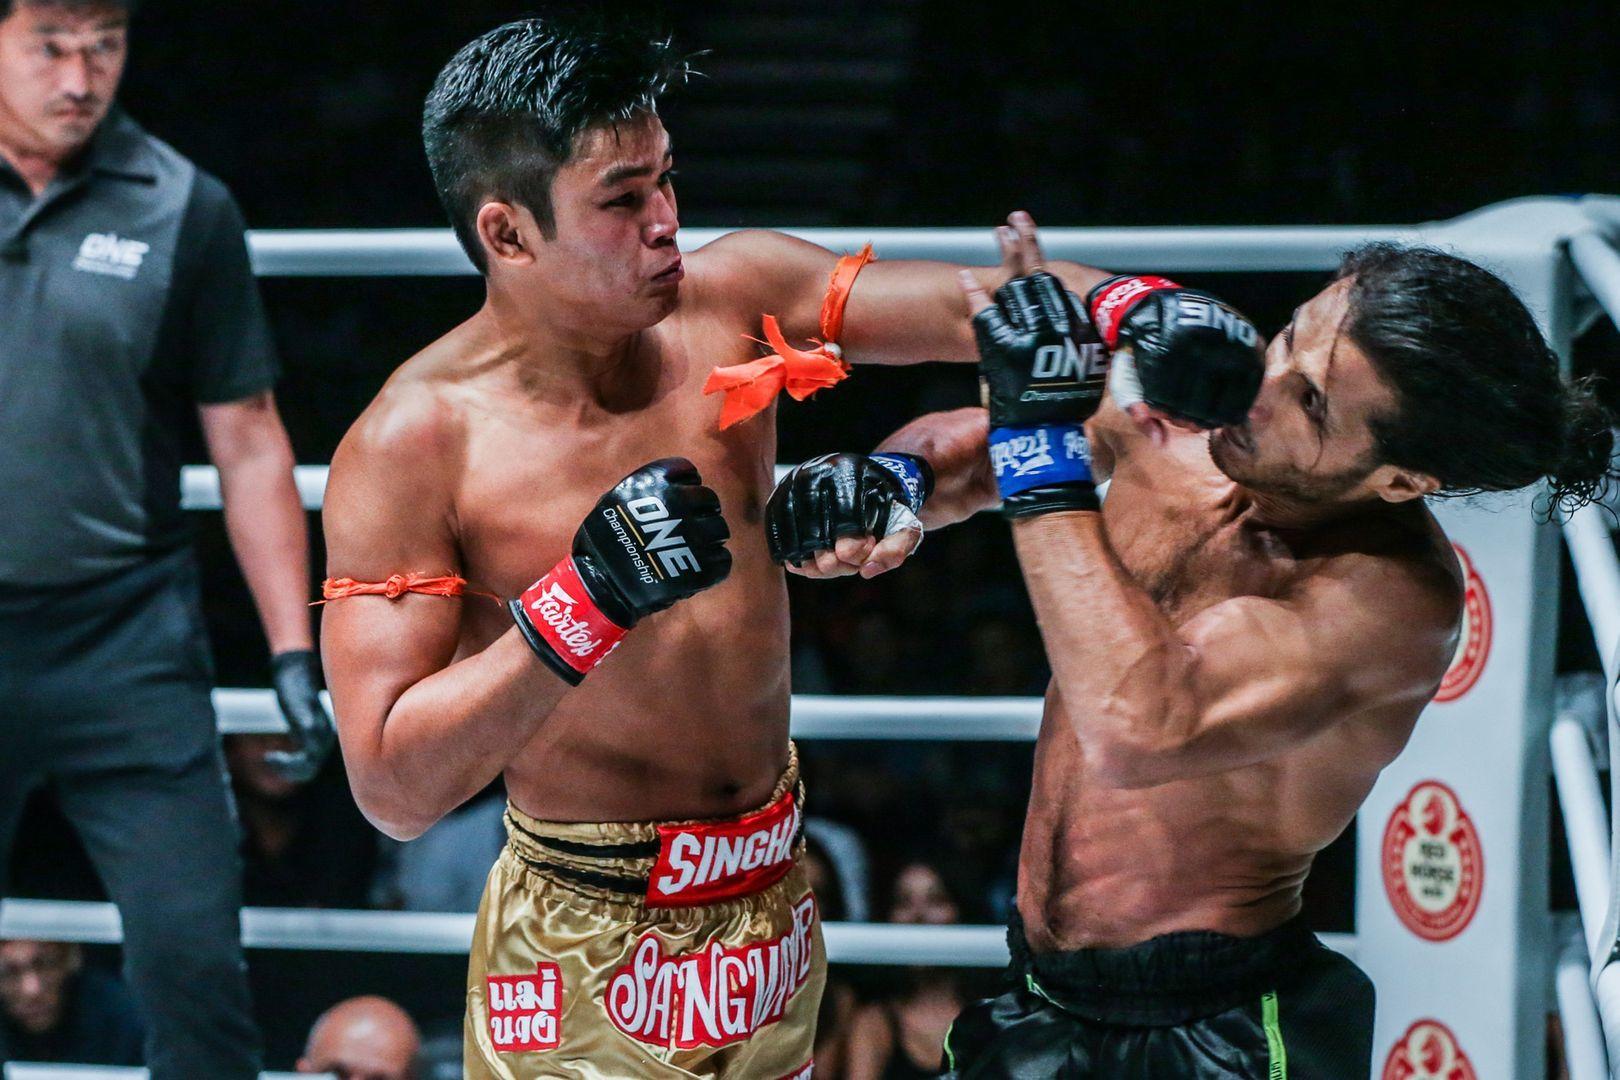 Tiebreaker Times Sangmanee targets finish in clash against Kulabdam Muay Thai News ONE Championship  Sangmanee Klong SuanPluResort ONE: No Surrender Kulabdam Sor. Jor. Piek Uthai